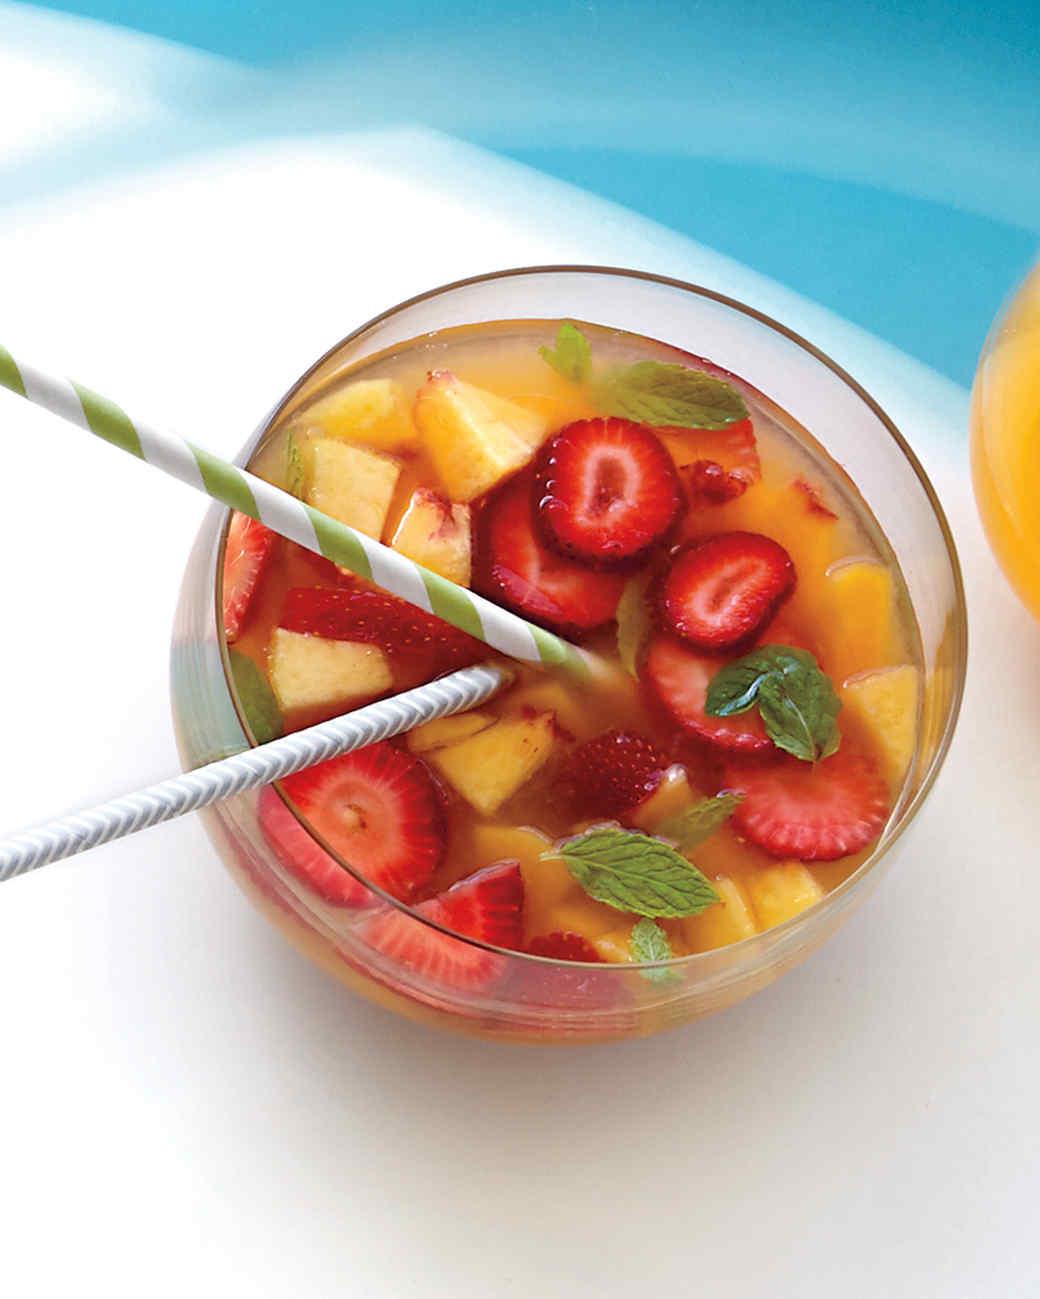 tiki-scorpion-bowl-tropical-transformation-cocktails-spread-three-112-d112024r.jpg